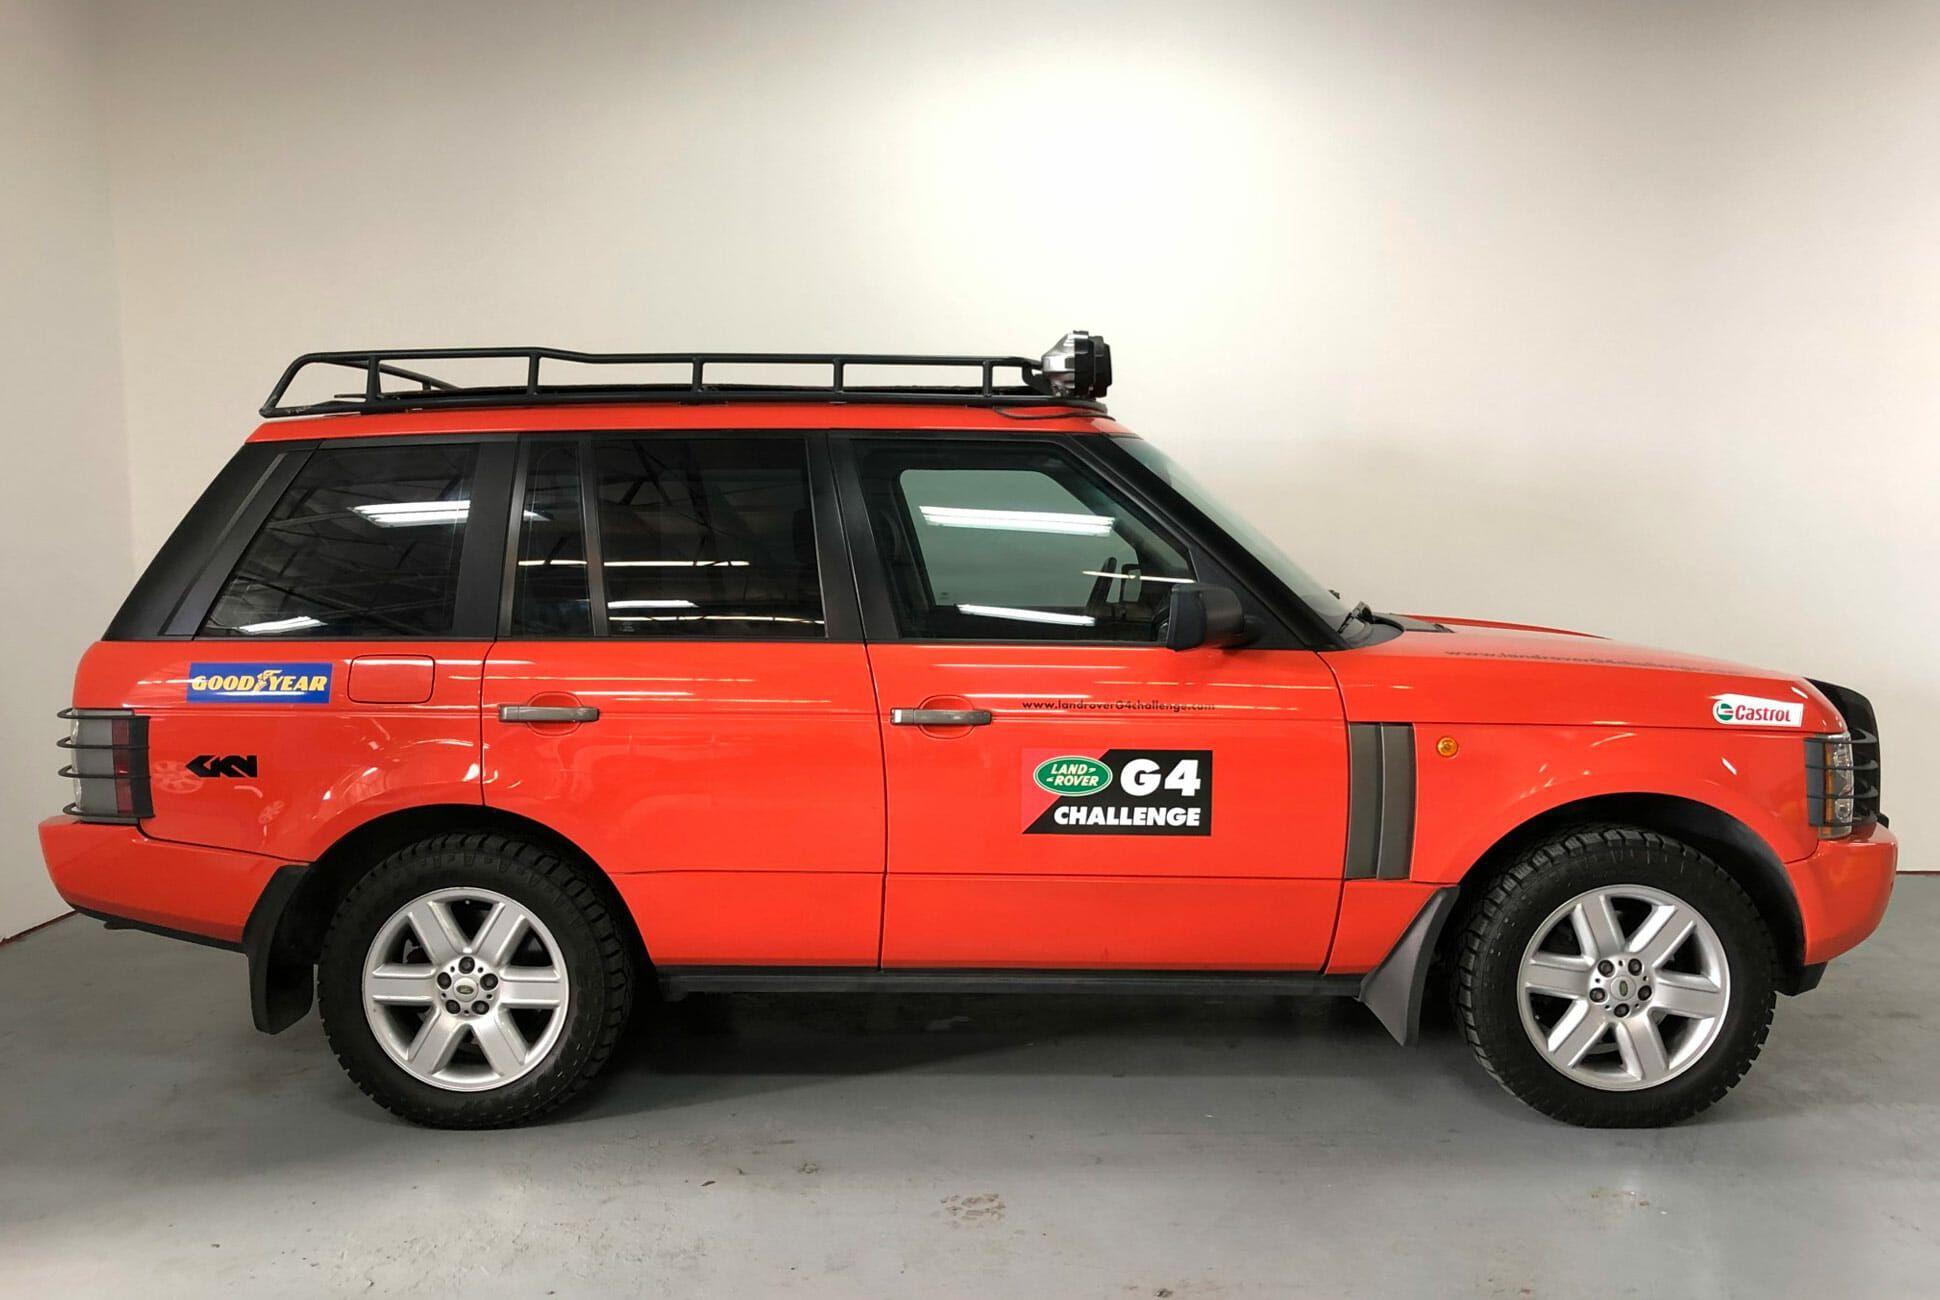 2003-Land-Rover-Range-Rover-G4-gear-patrol-slide-3